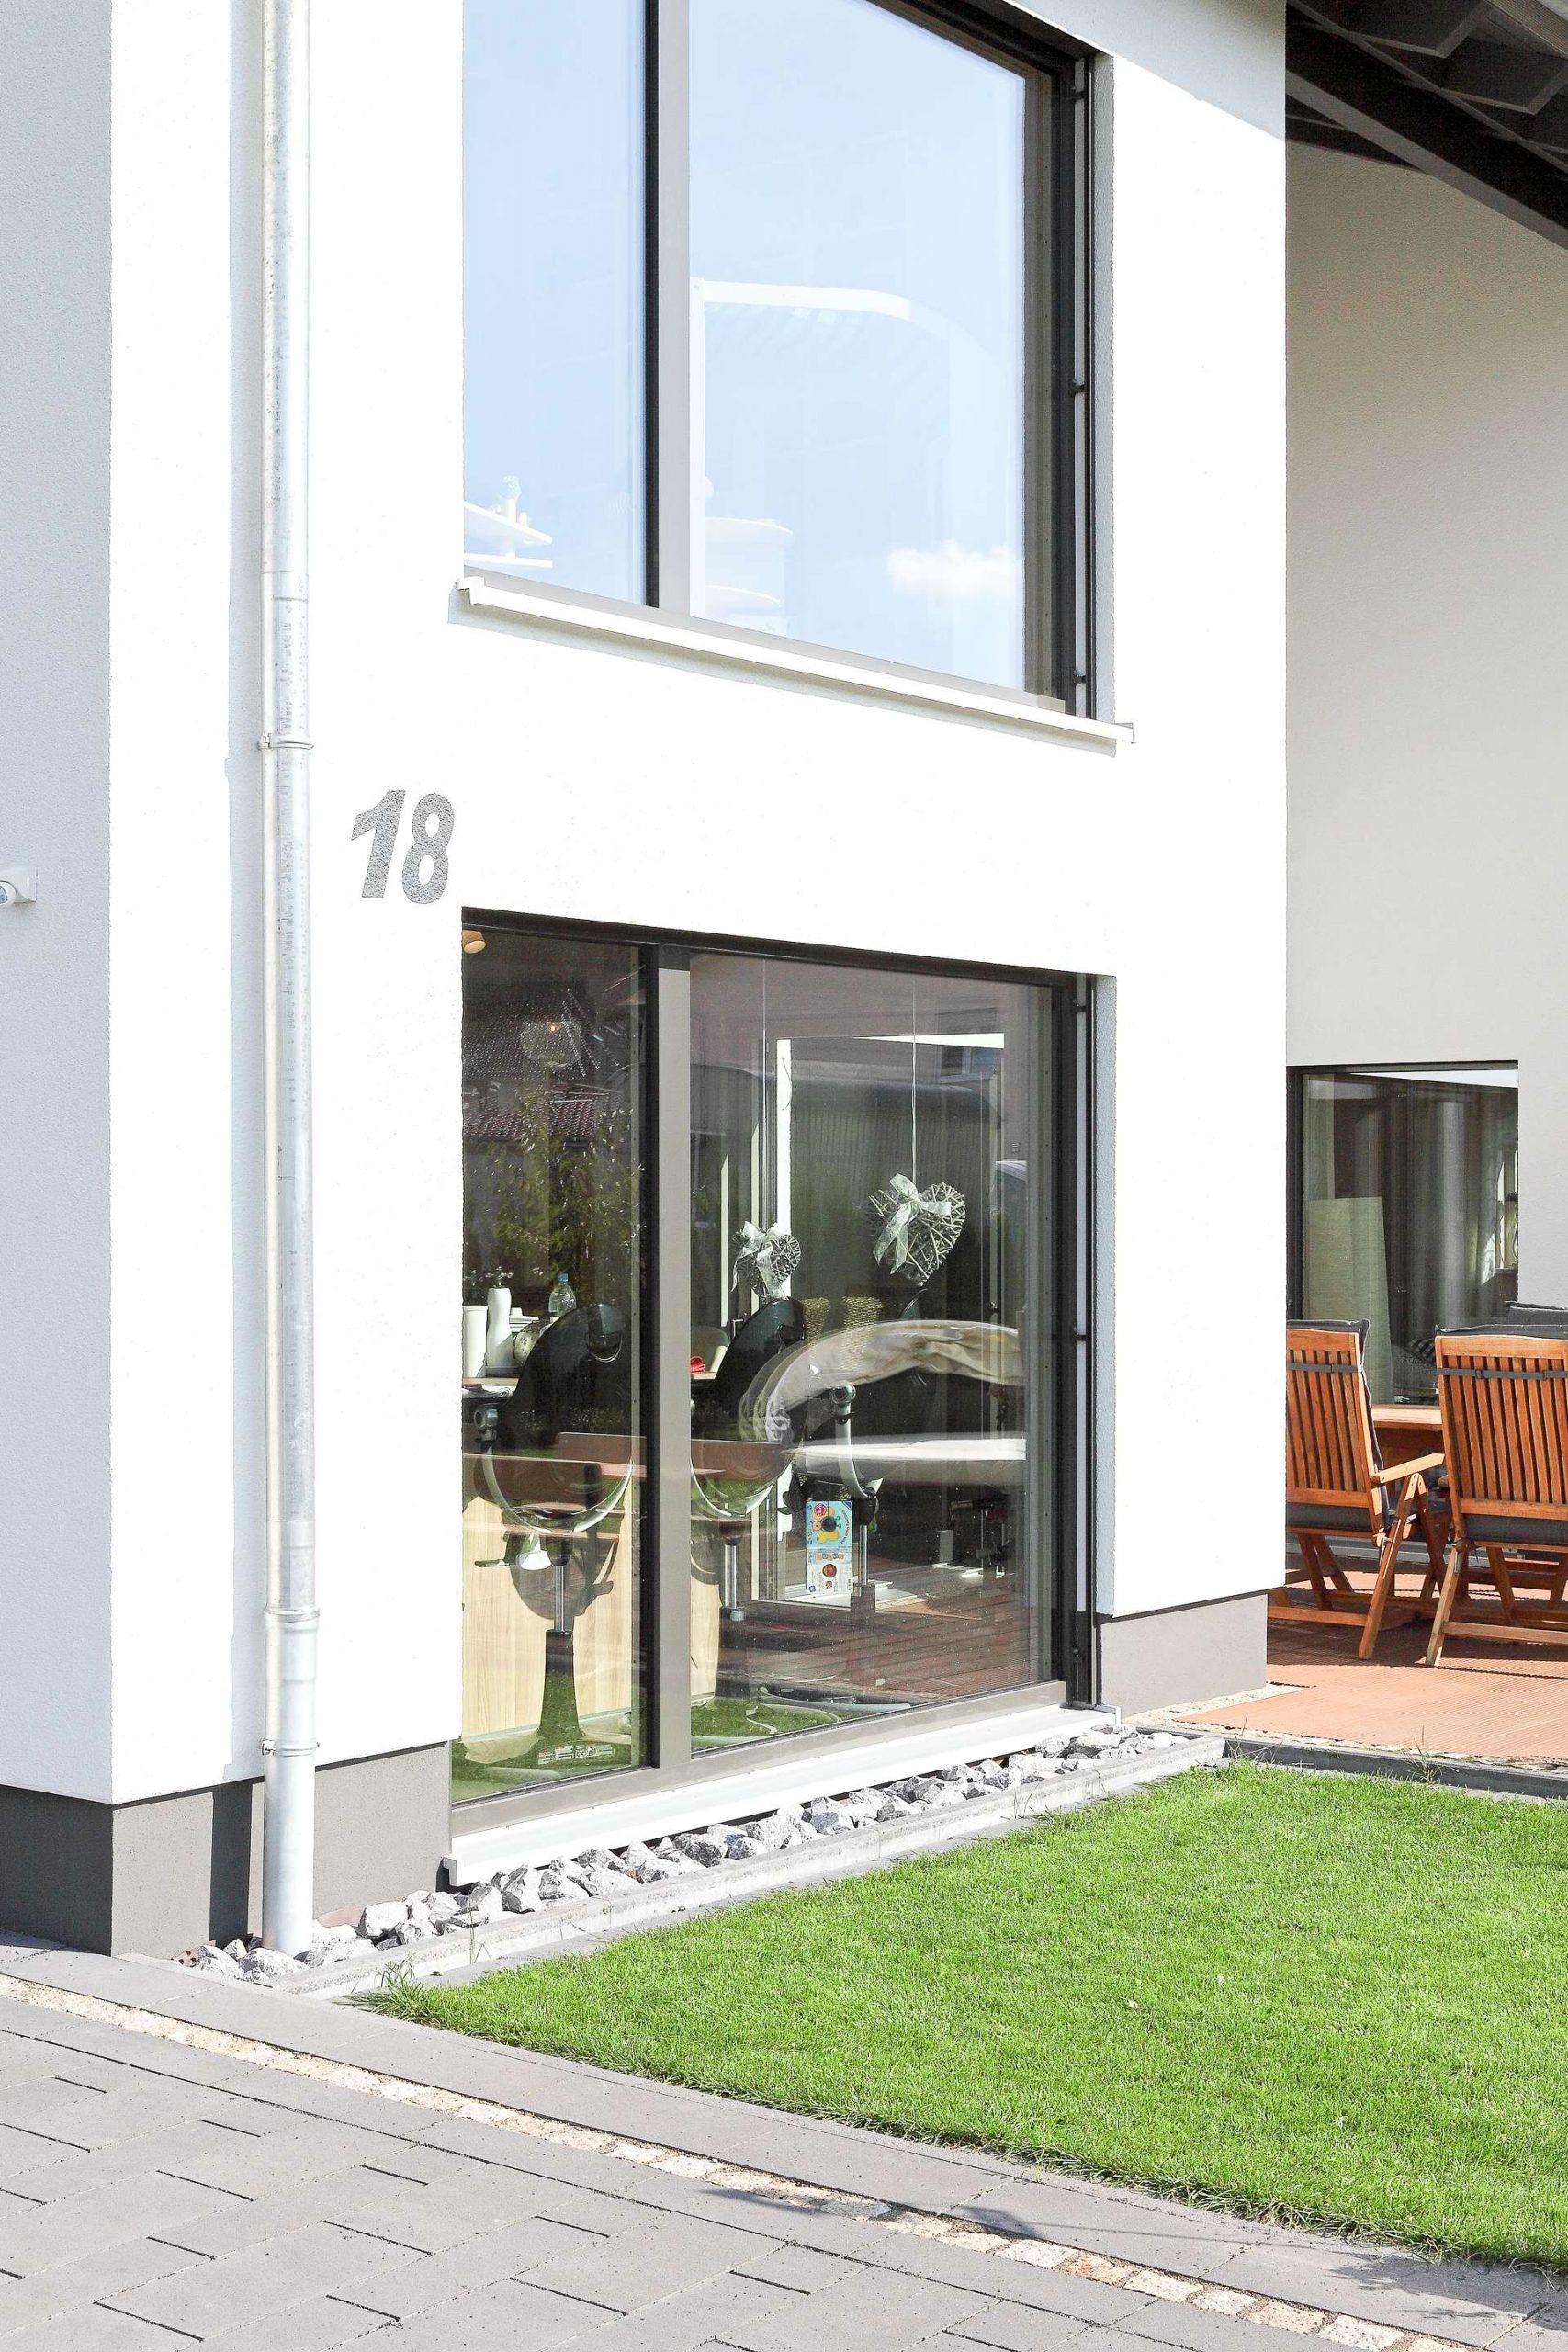 Full Size of Welche Fenster Holz Alu Kunststoff Preise Pro Qm Aluminium Kunststofffenster Preisvergleich Kosten Holz Alu Fenster Kaufen Kostenvergleich Holz Aluminium Fenster Fenster Holz Alu